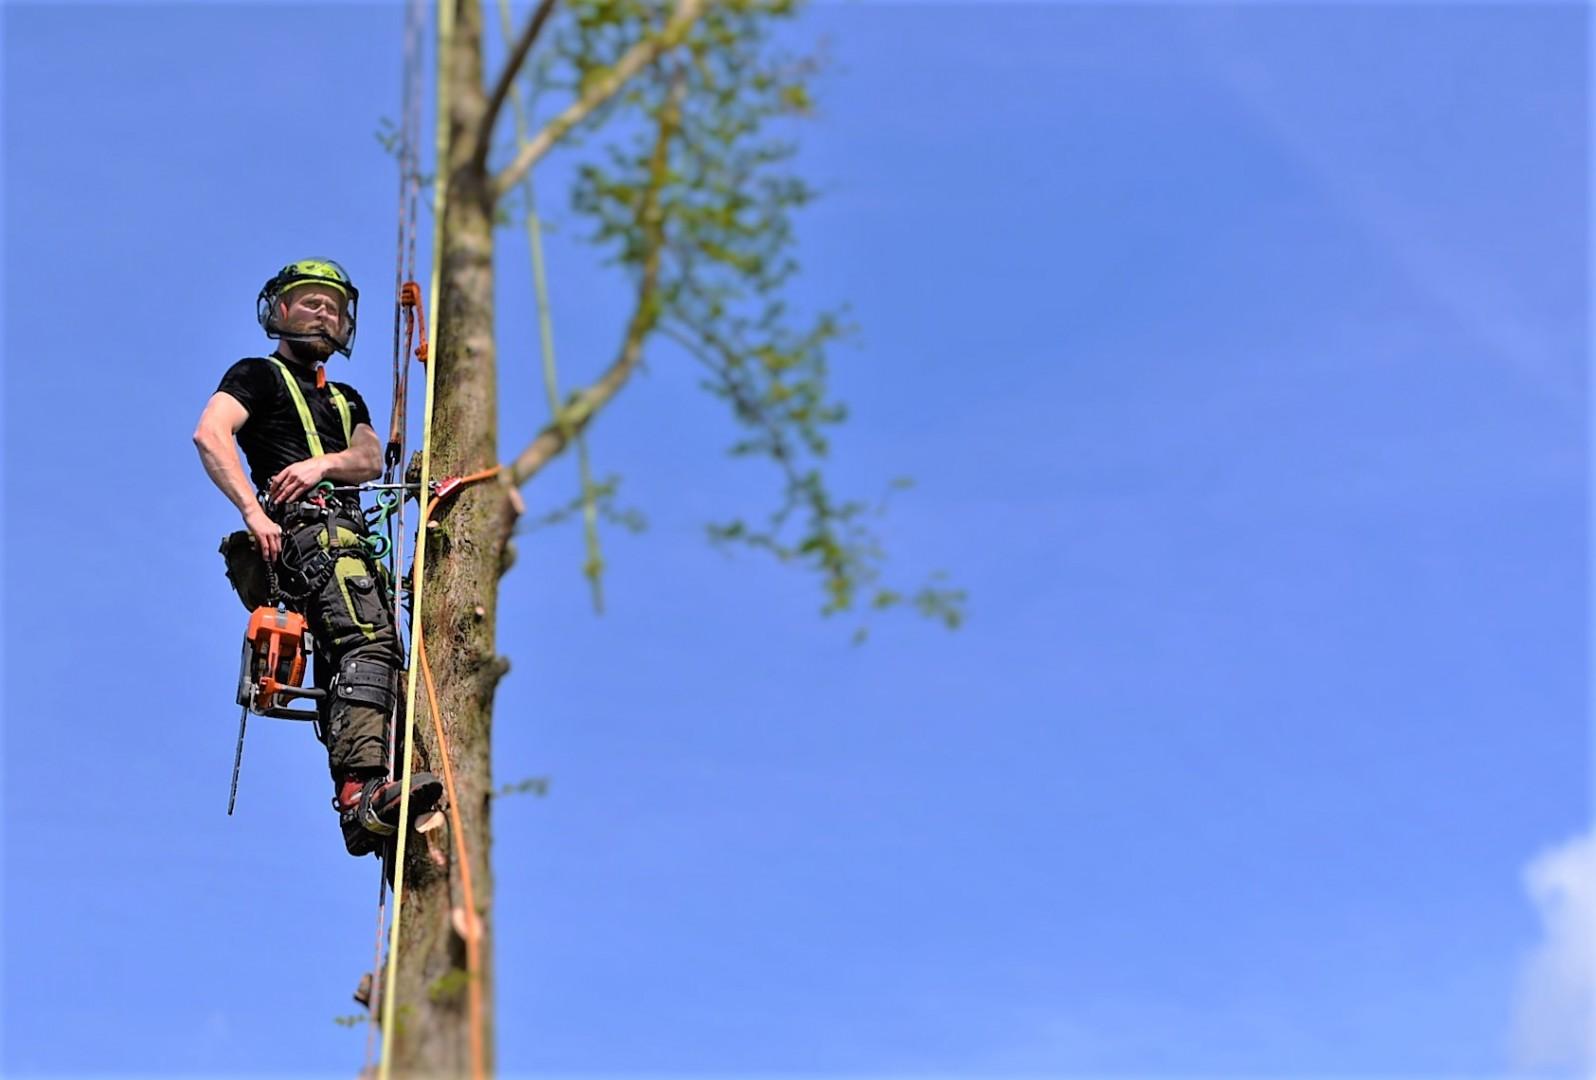 Tree surgery in Weymouth, Weymouth tree surgery, Weymouth tree surgeons, tree felling, dawn redwood